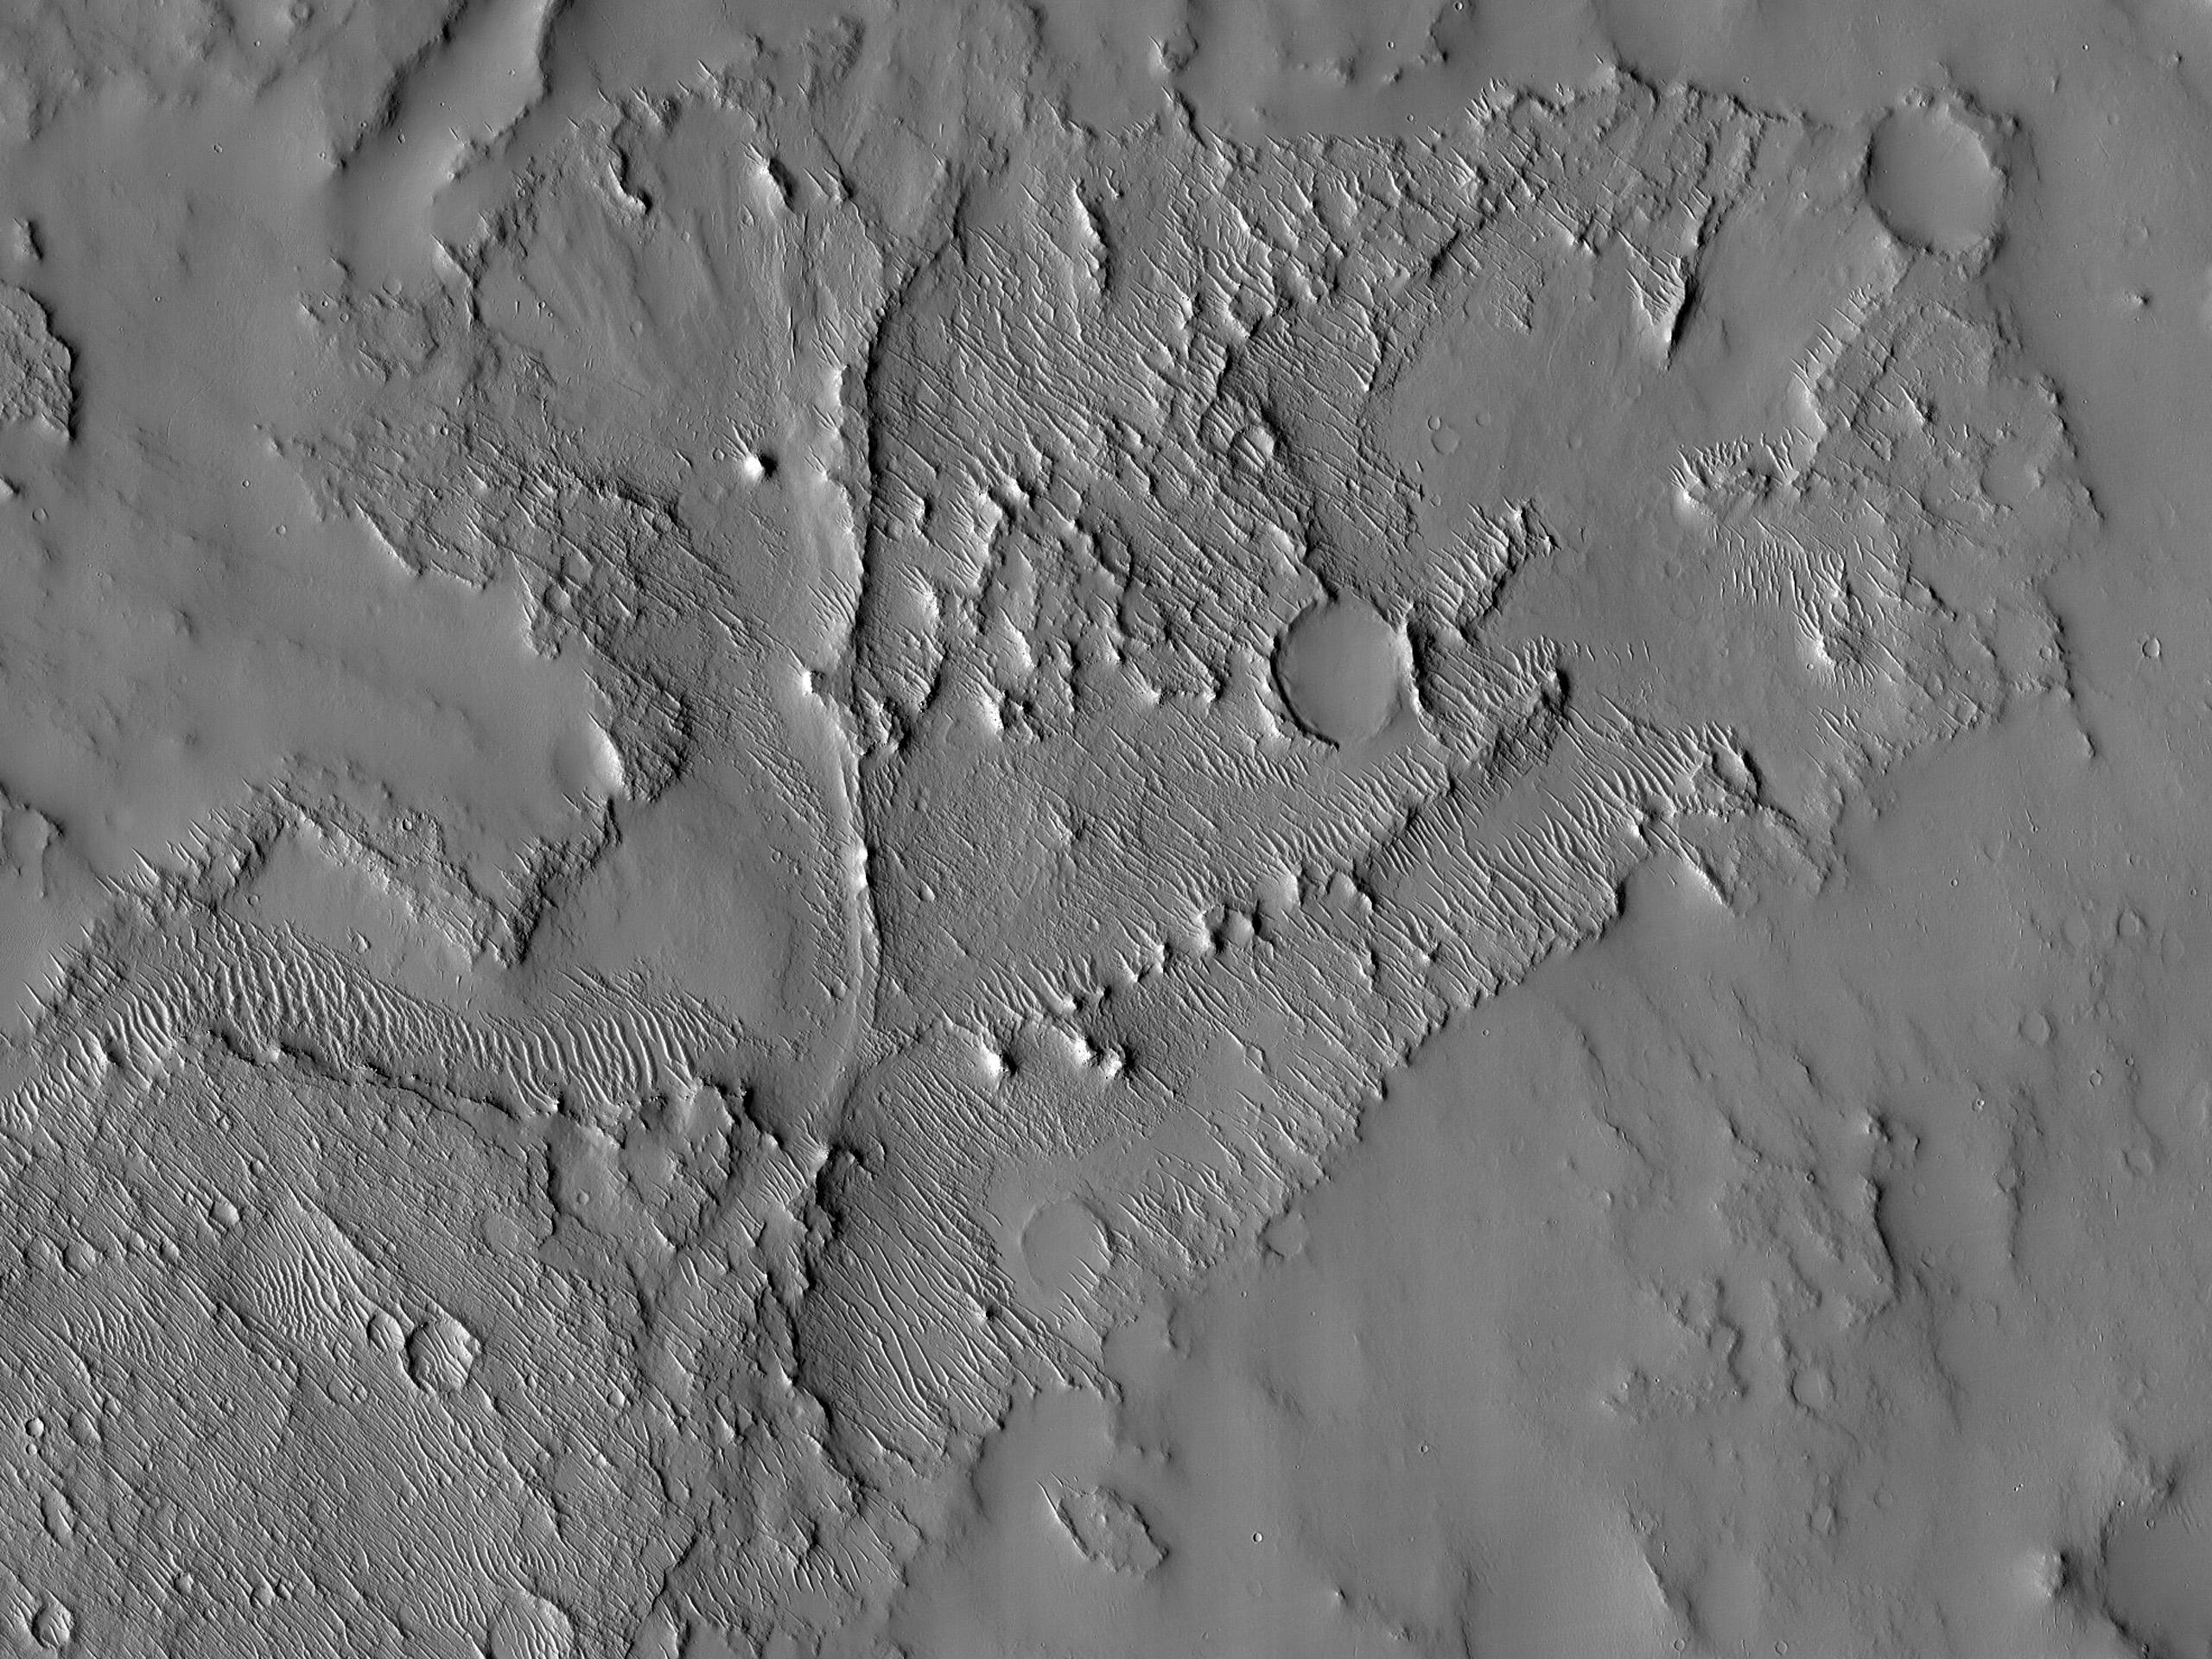 Convergent Branched Ridges